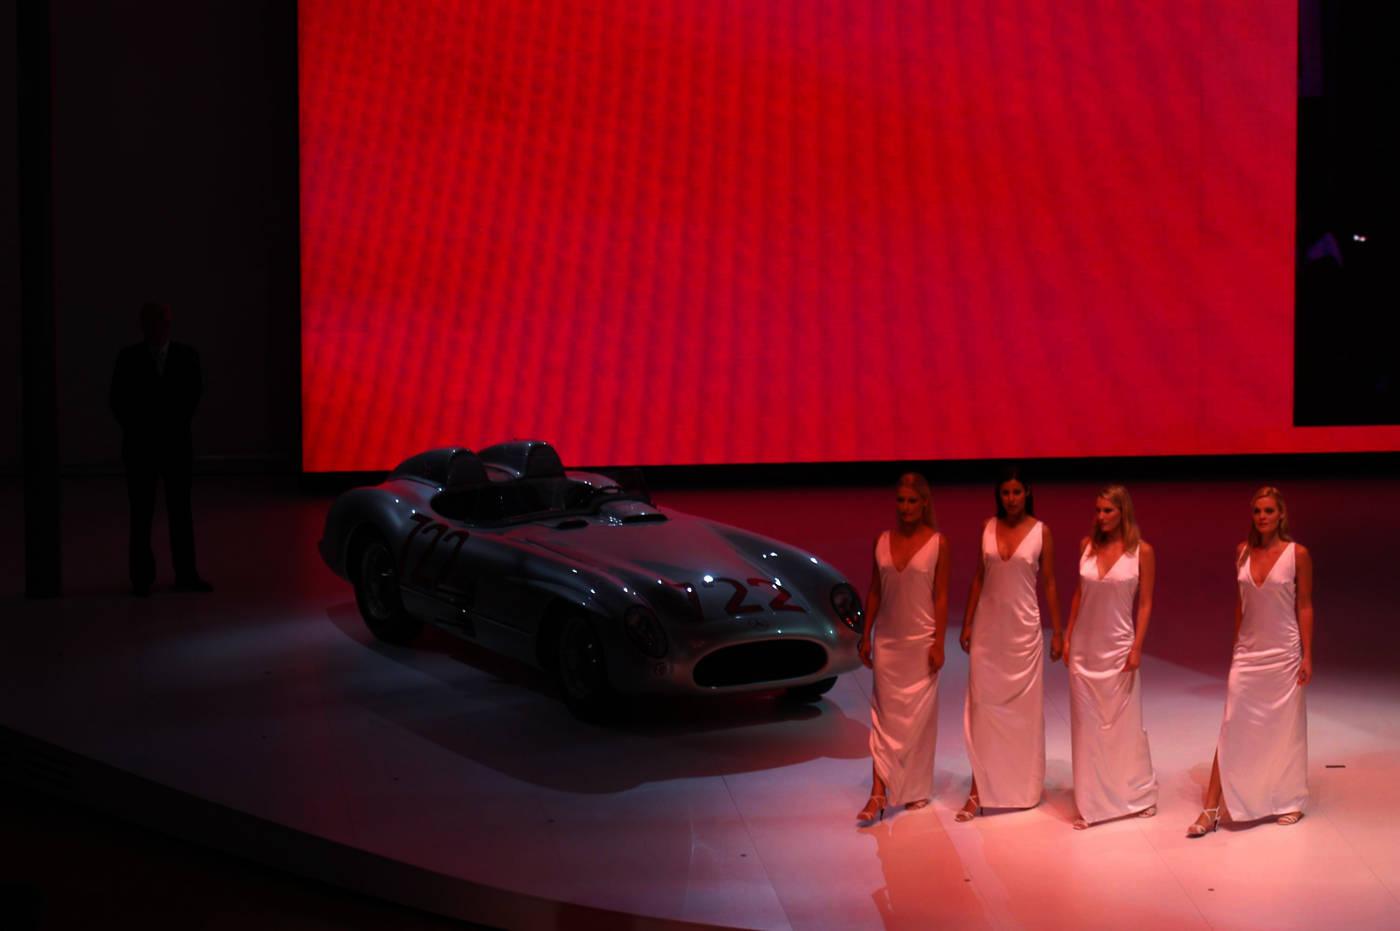 Weltpremiere Vision CLS Daimler Chrysler // entwurf und Anfertigung :/ Kostümbild tatjana lüpsen